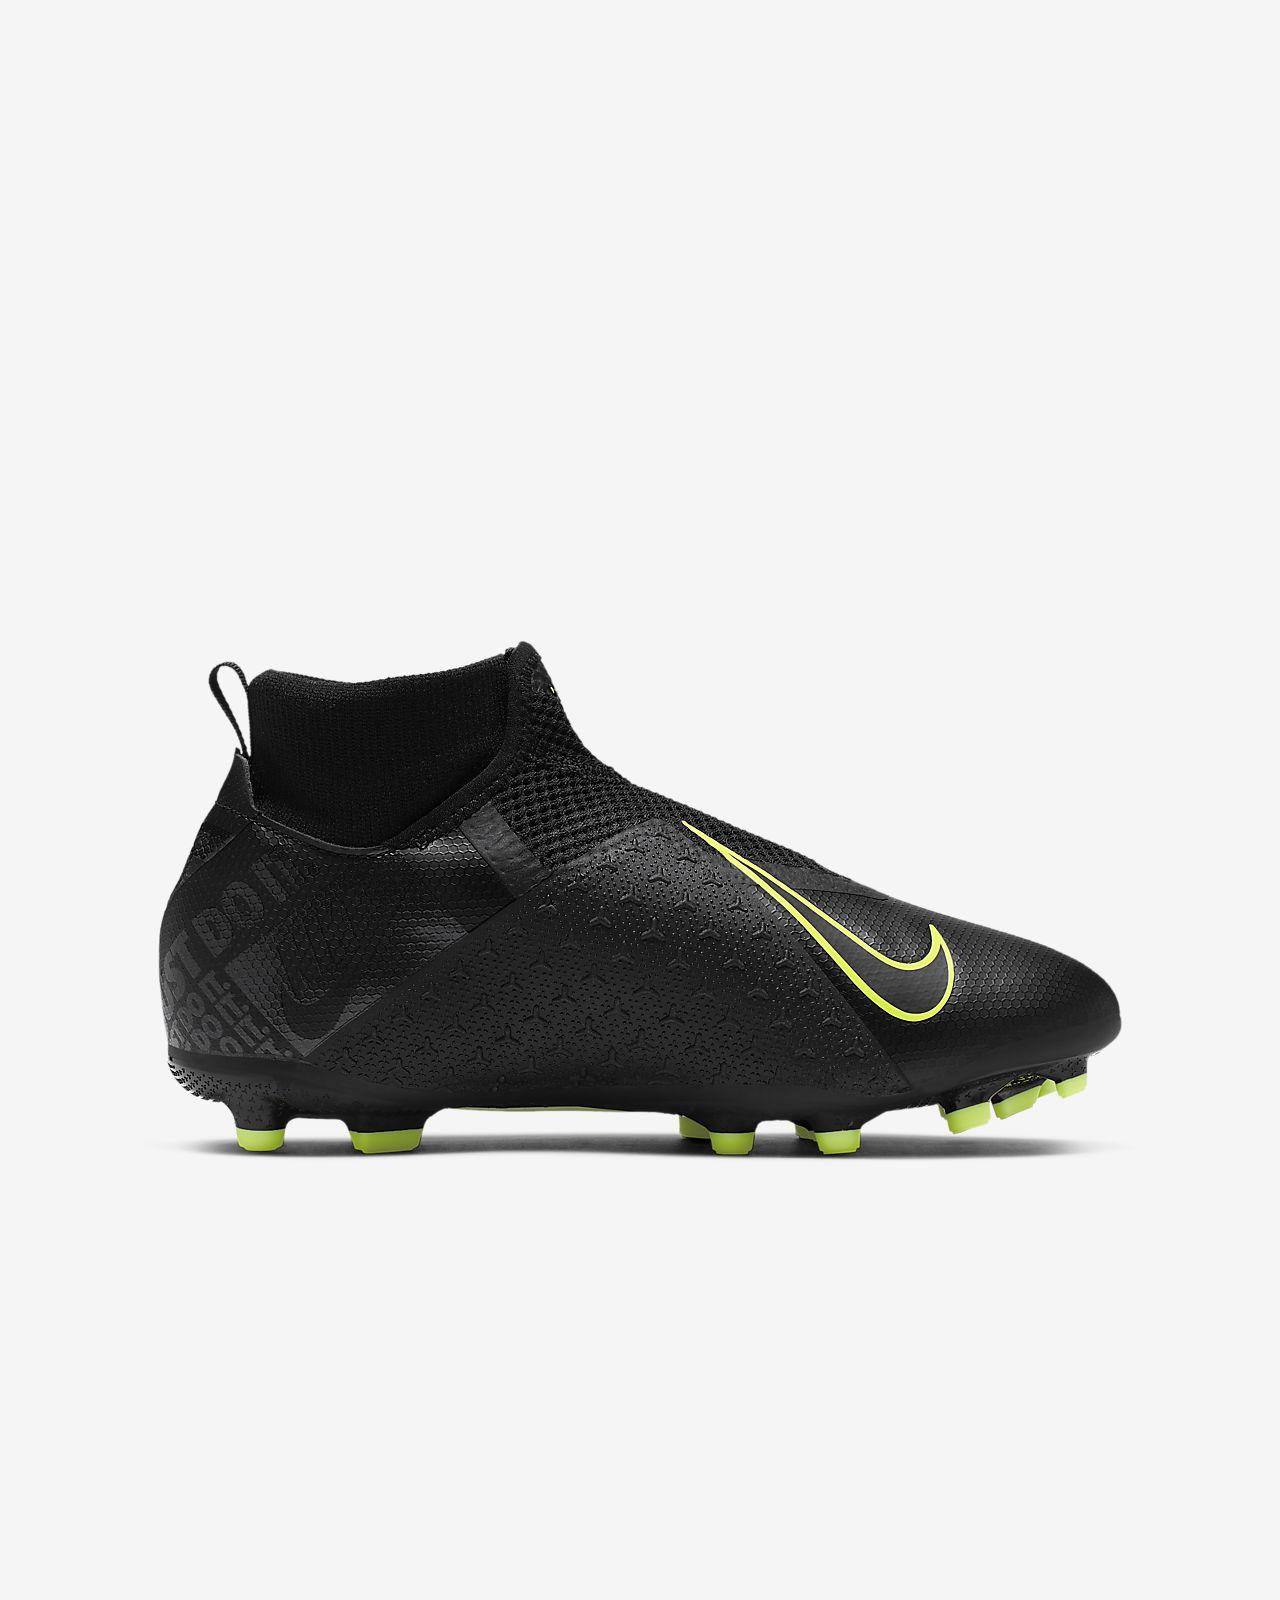 3355c5271 ... Nike Jr. Phantom Vision Academy Dynamic Fit MG Little/Big Kids' Multi-